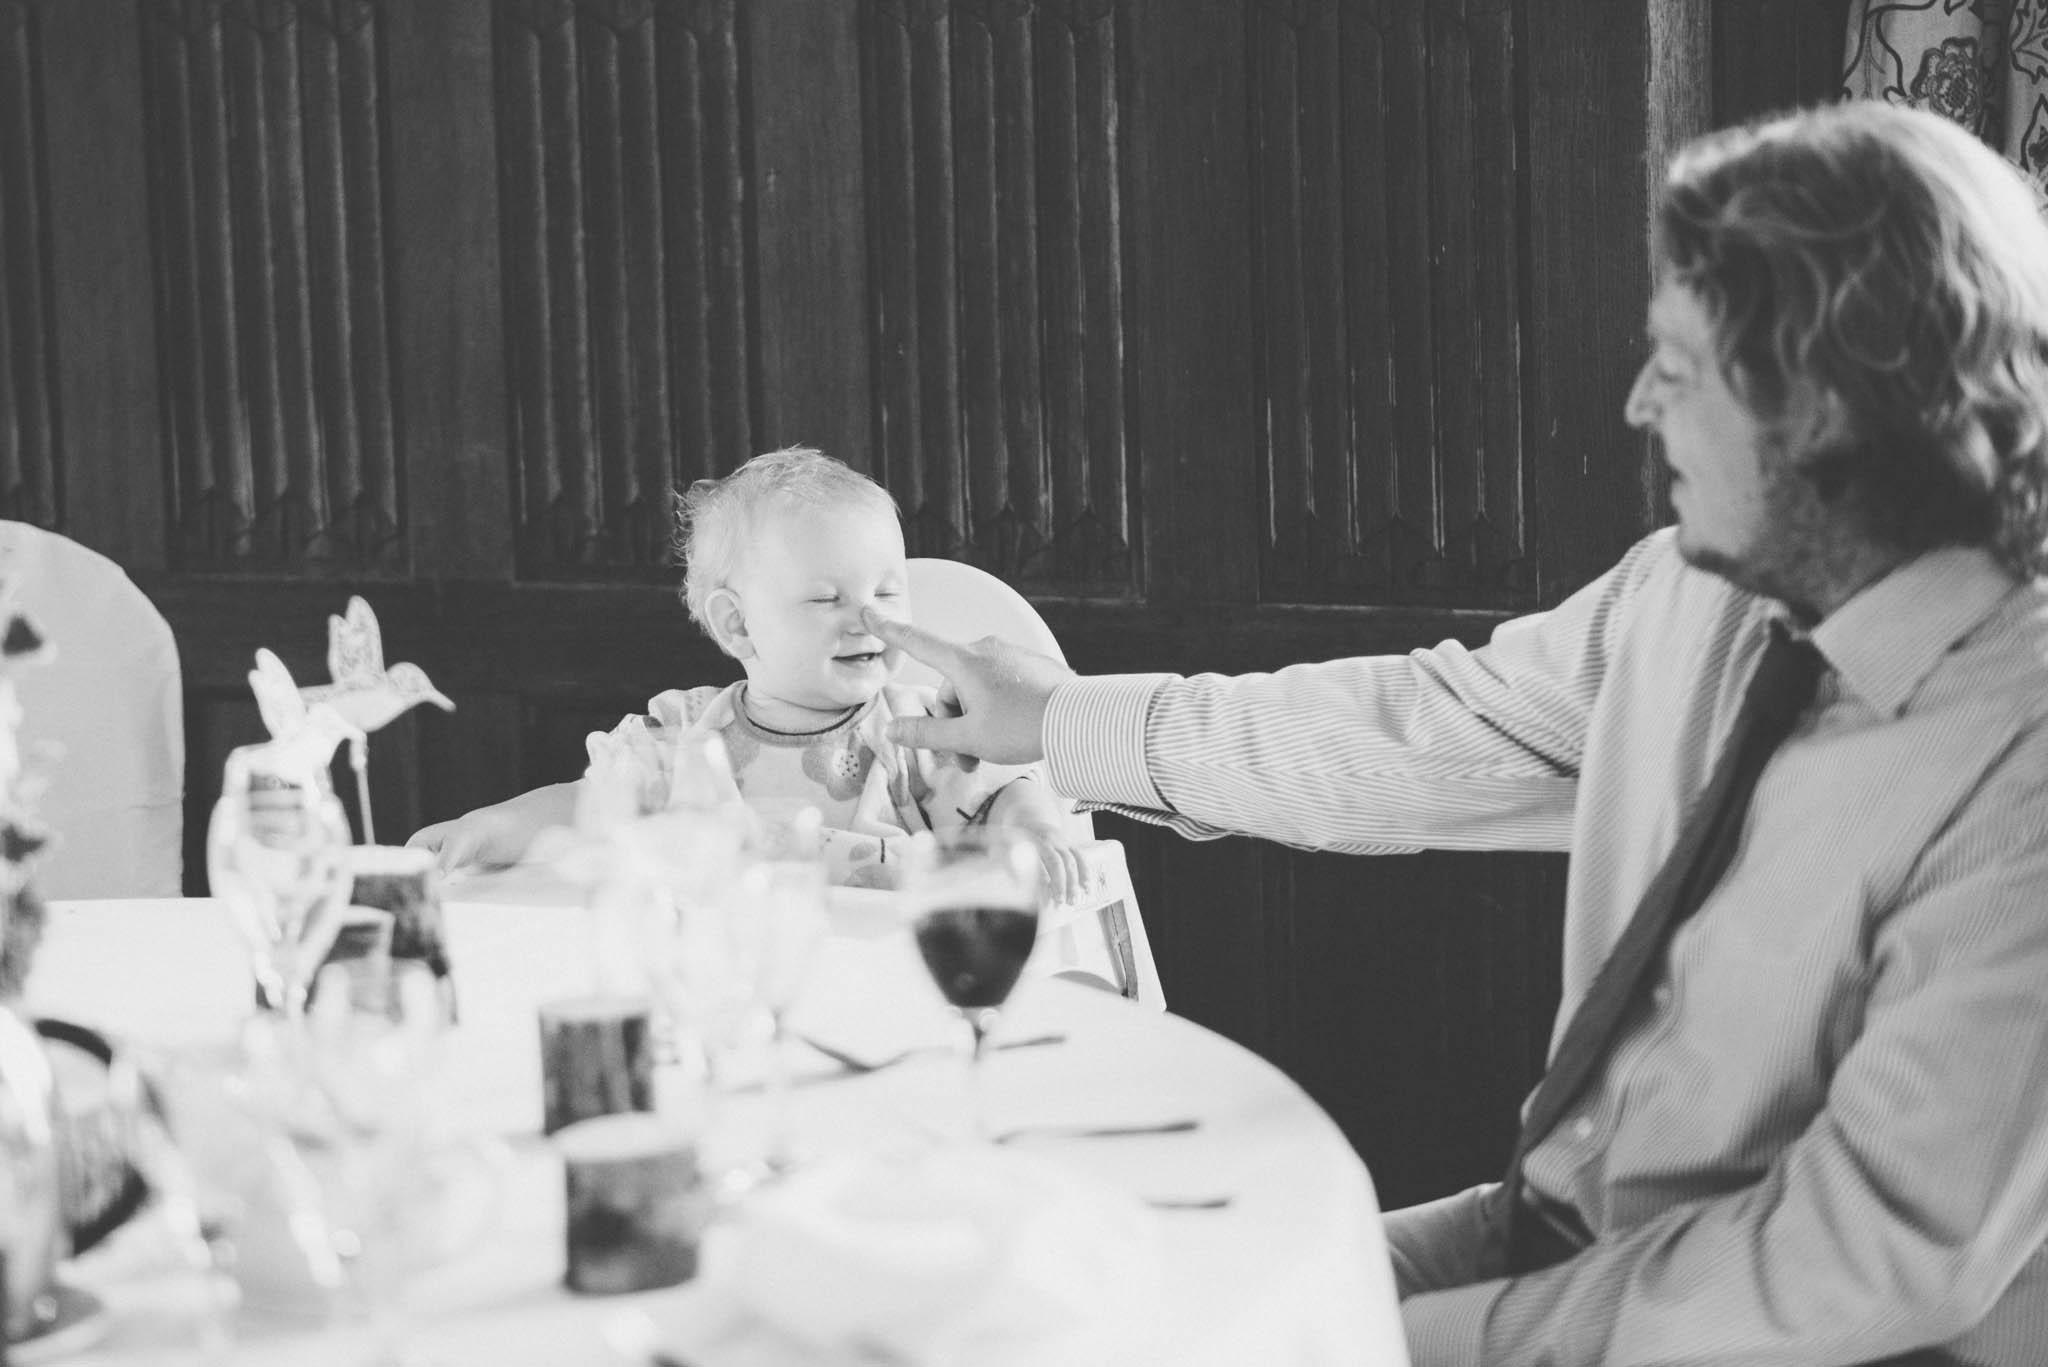 nose-wedding-blog-scott-stockwell-photography-end-2017.jpg